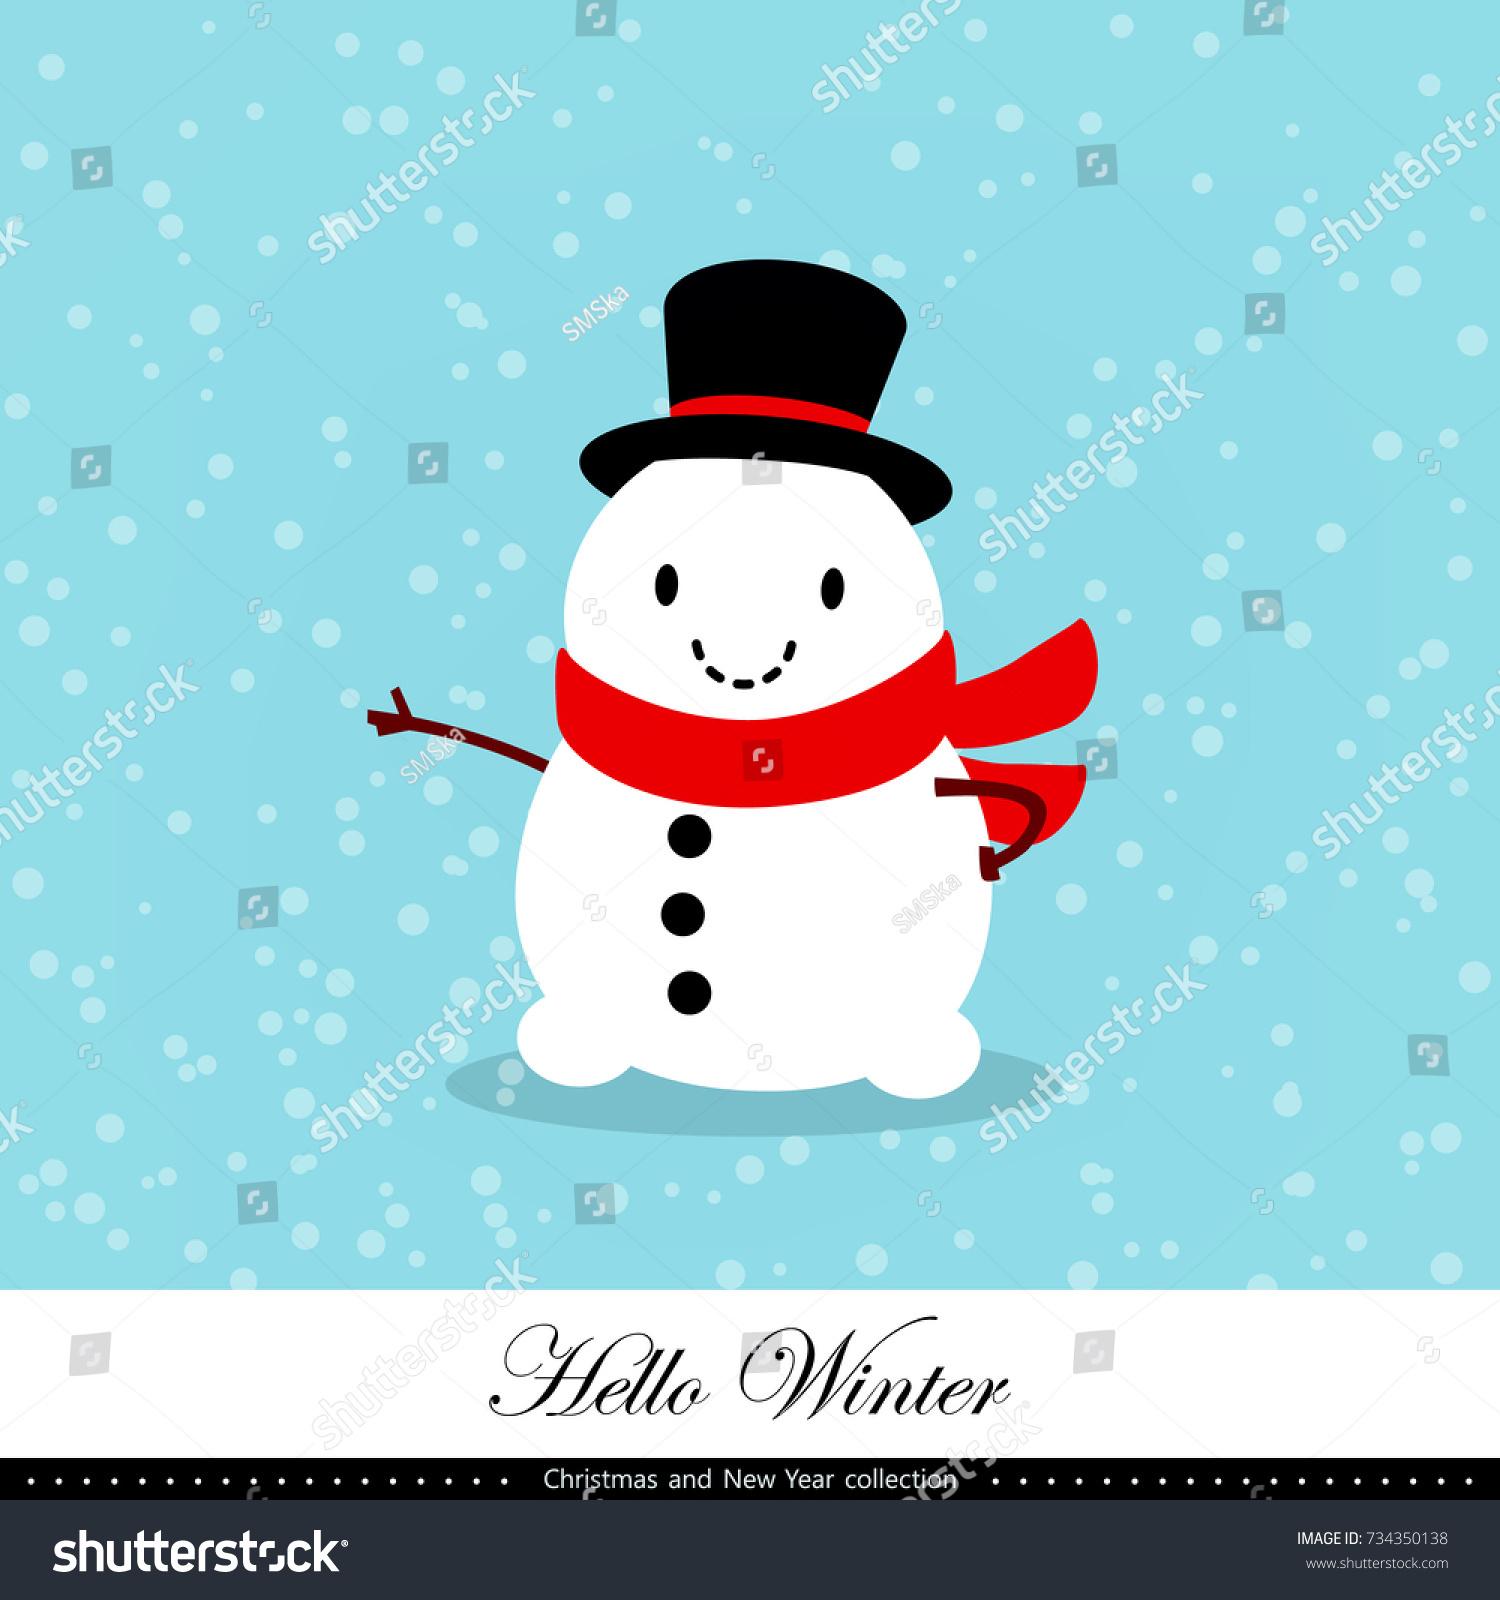 Playful snowman winter christmas new year stock vector